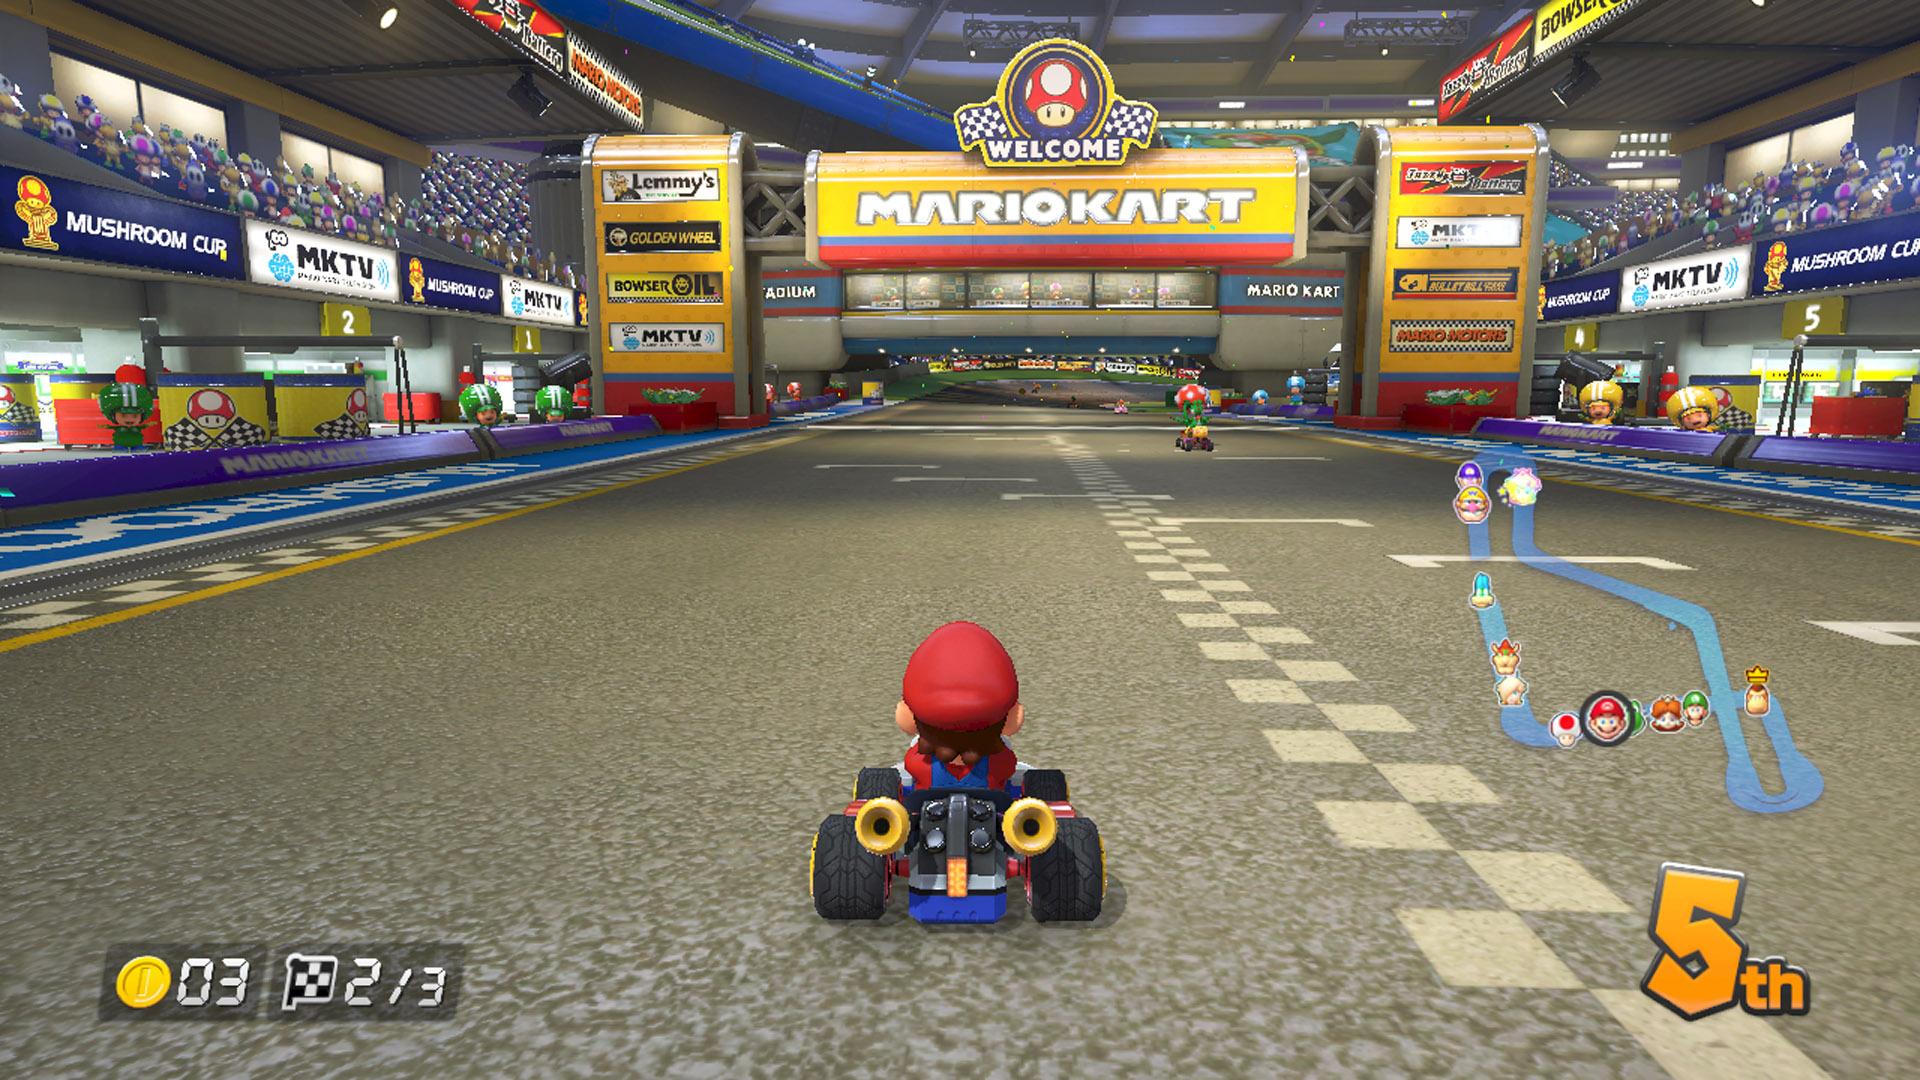 Image result for mario kart 8 screenshot